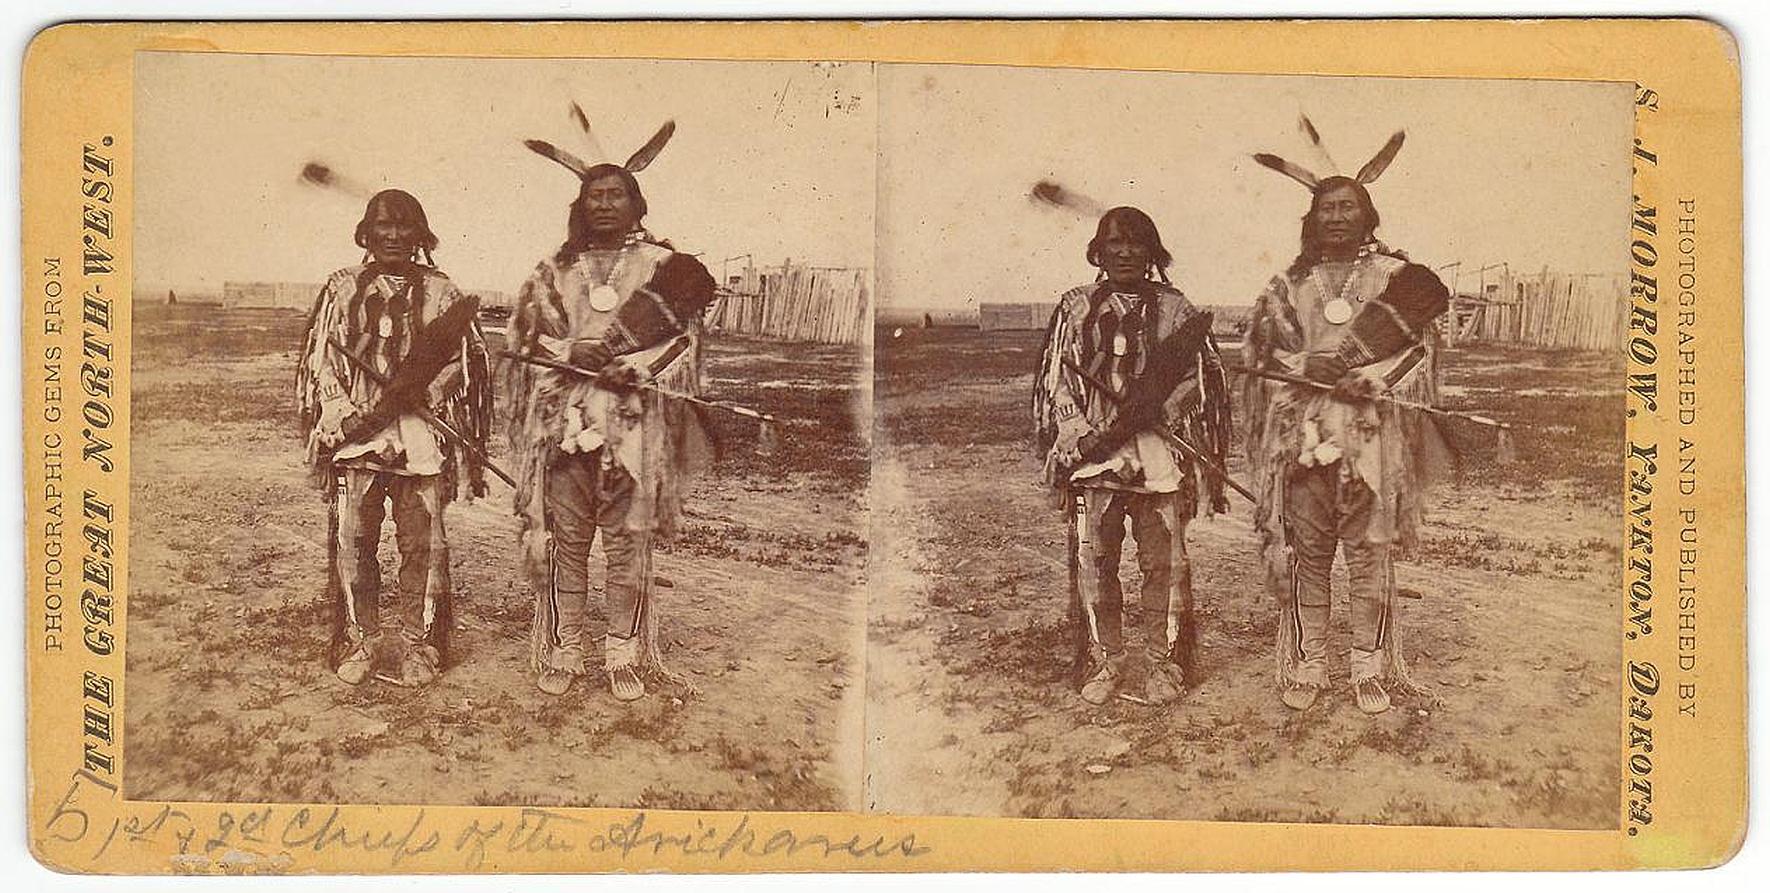 http://www.american-tribes.com/messageboards/dietmar/morrowarikara.jpg